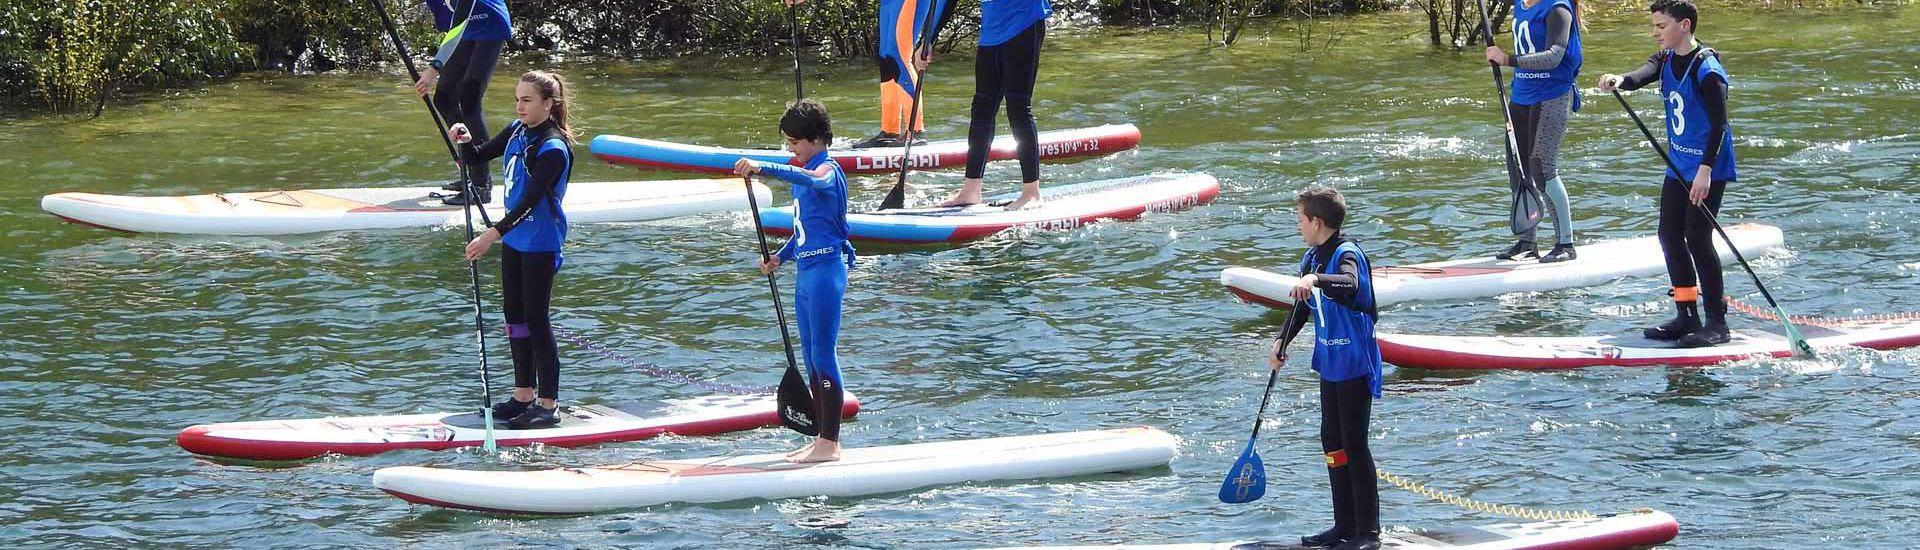 Paddle Surf Camp Barcelona e571813de8f